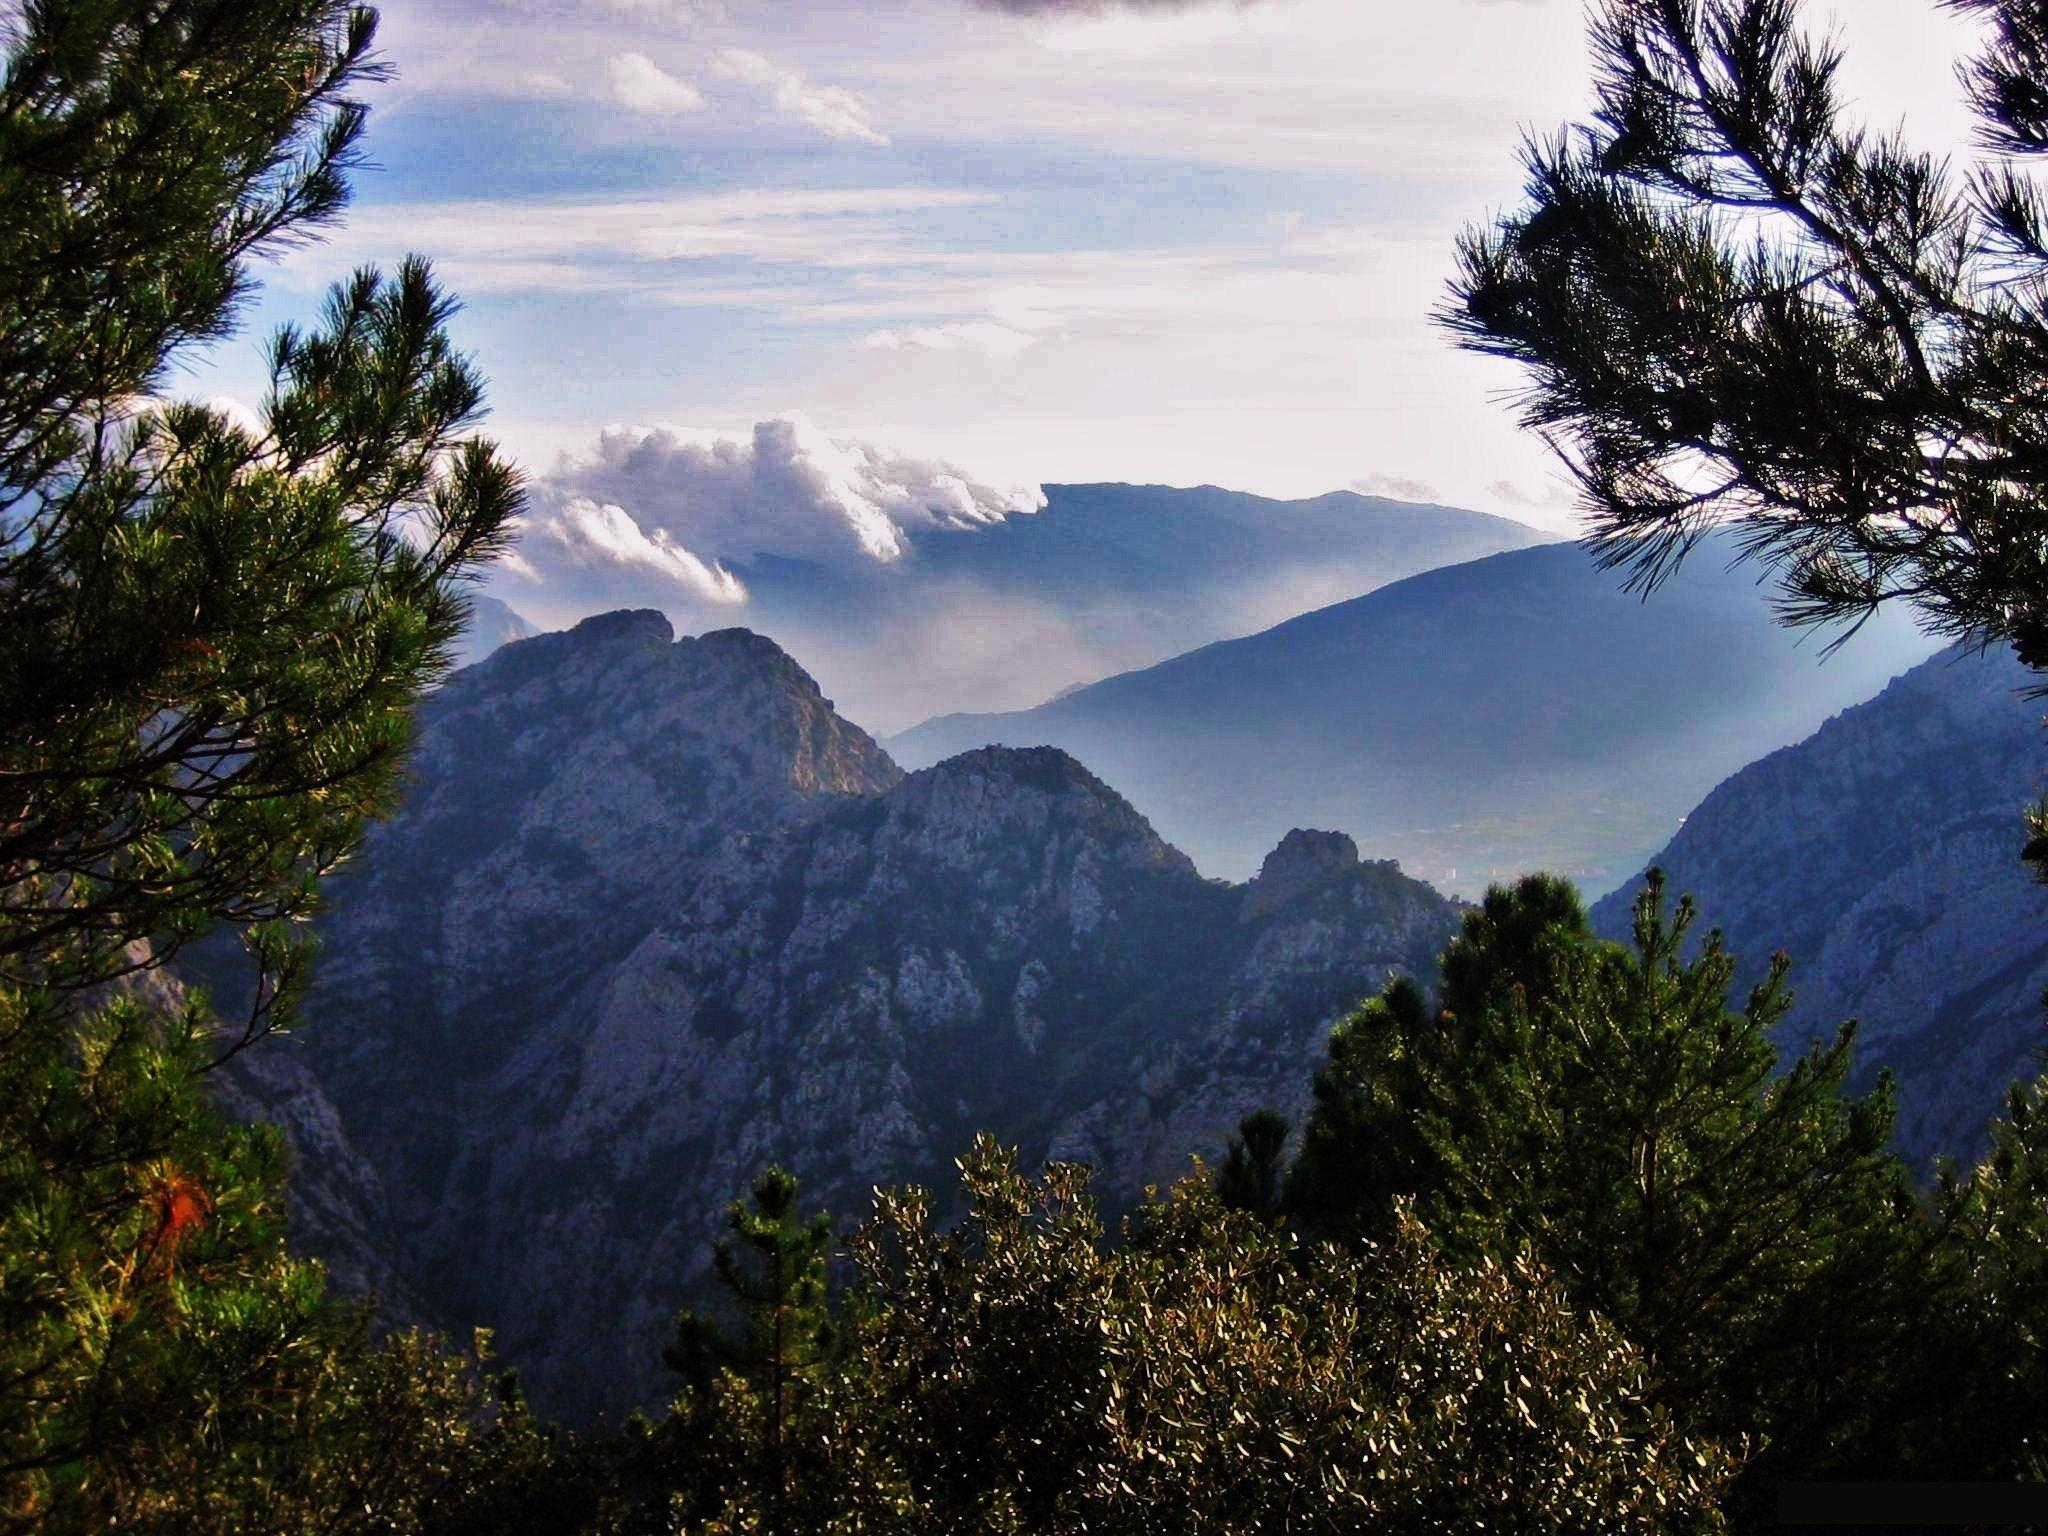 Pirineu Català